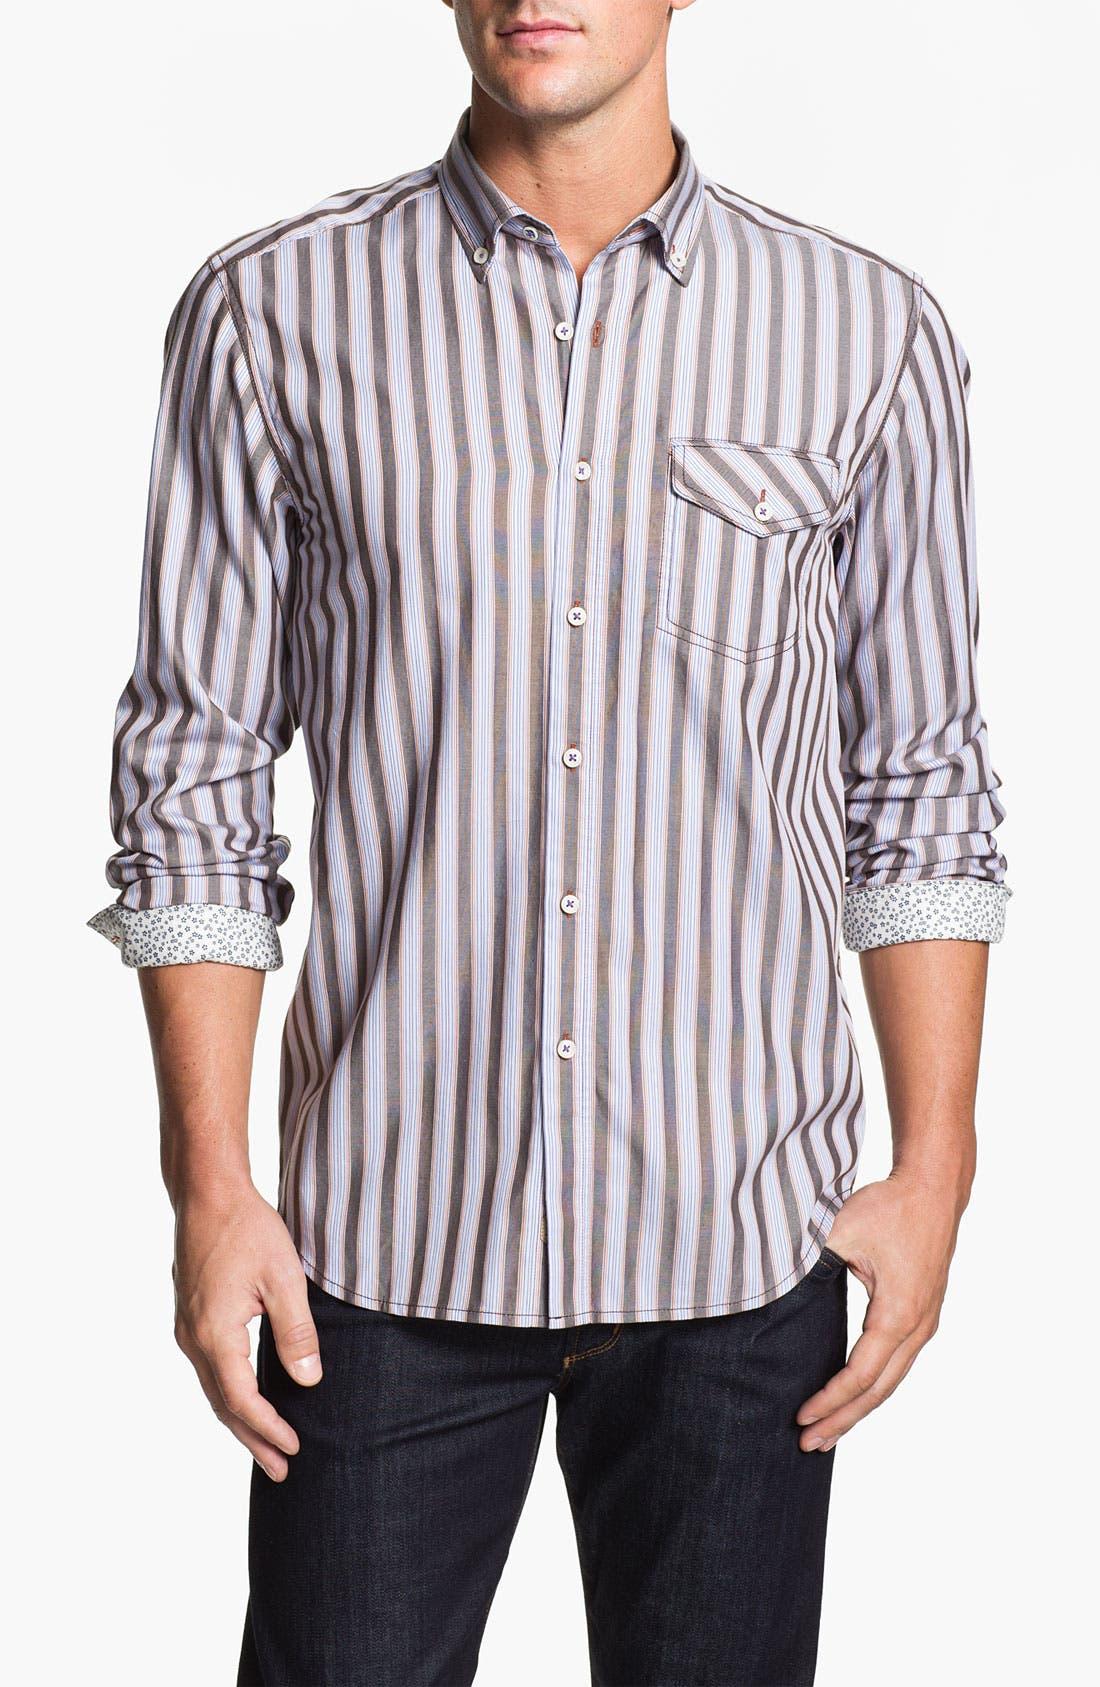 Alternate Image 1 Selected - Tommy Bahama Denim 'Ship to Shore' Sport Shirt